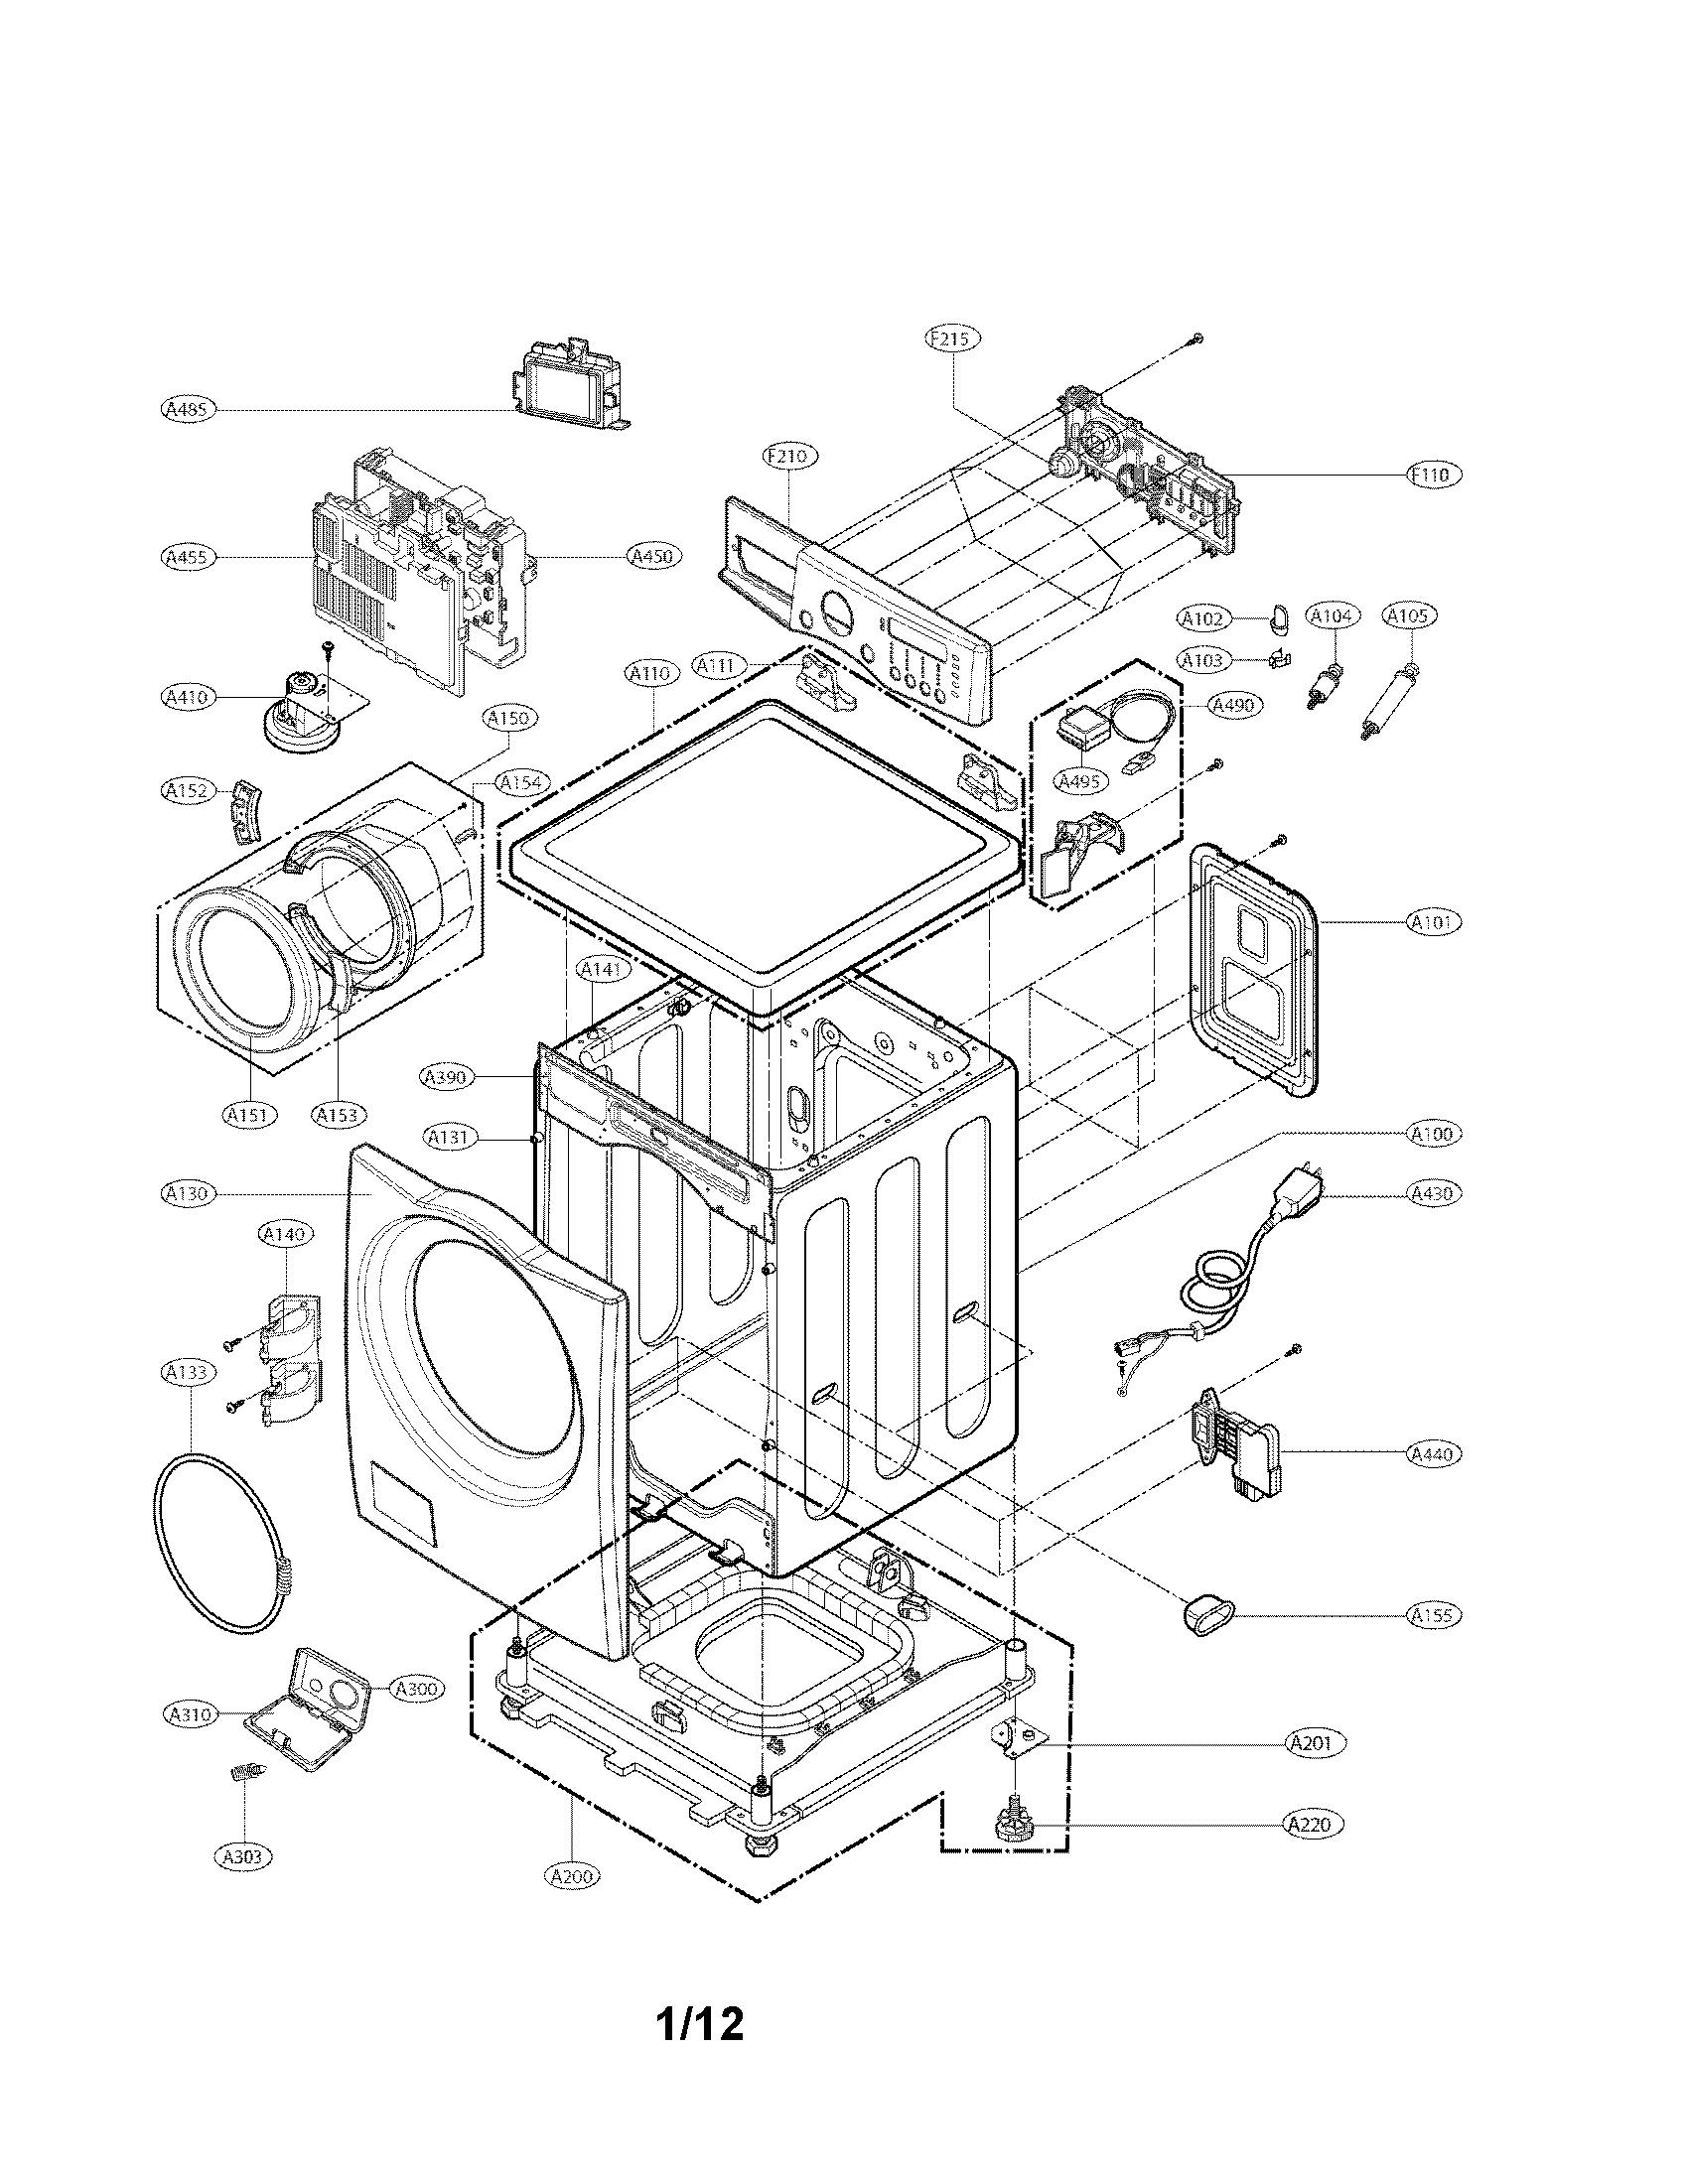 Lg model WM2077CW/00 residential washers genuine parts